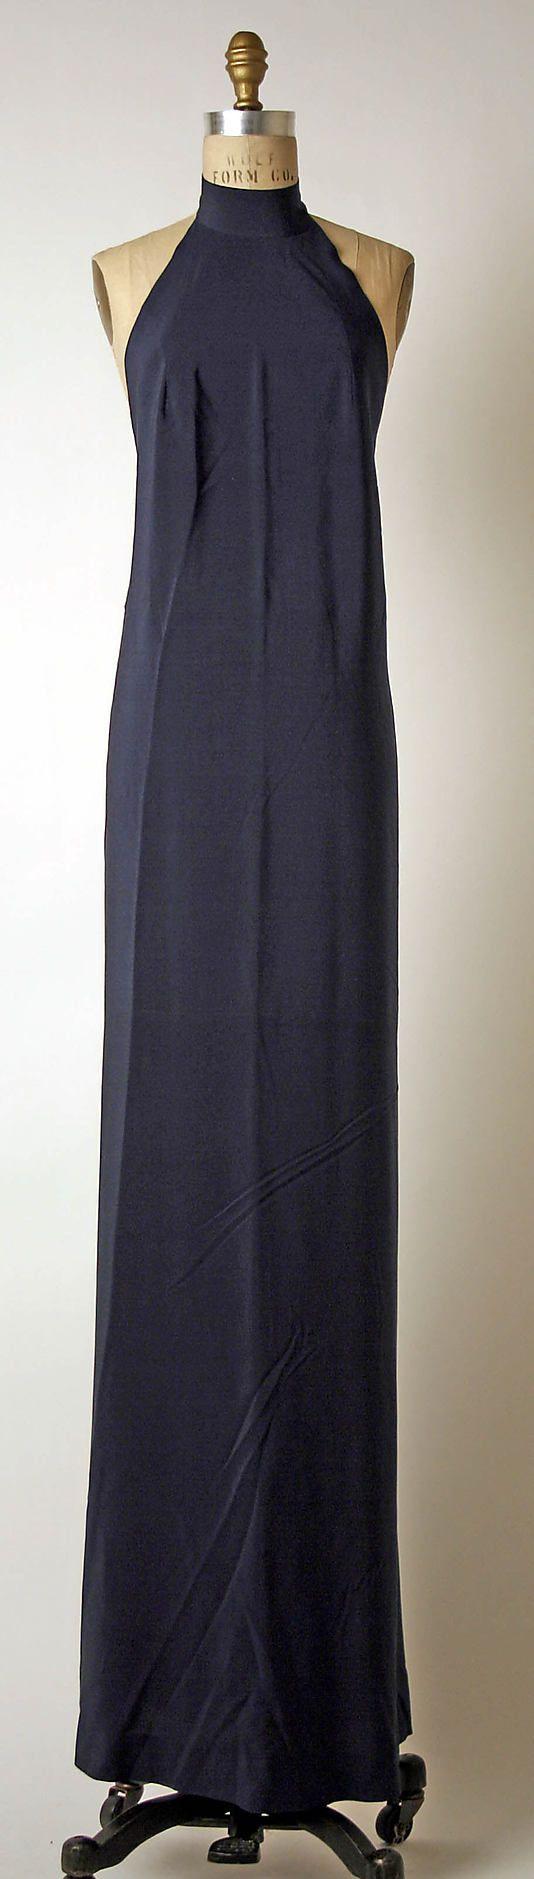 Dress, Evening  Madame Grès (Alix Barton)  (French, Paris 1903–1993 Var region)   Date:late 1960s–mid-1980s